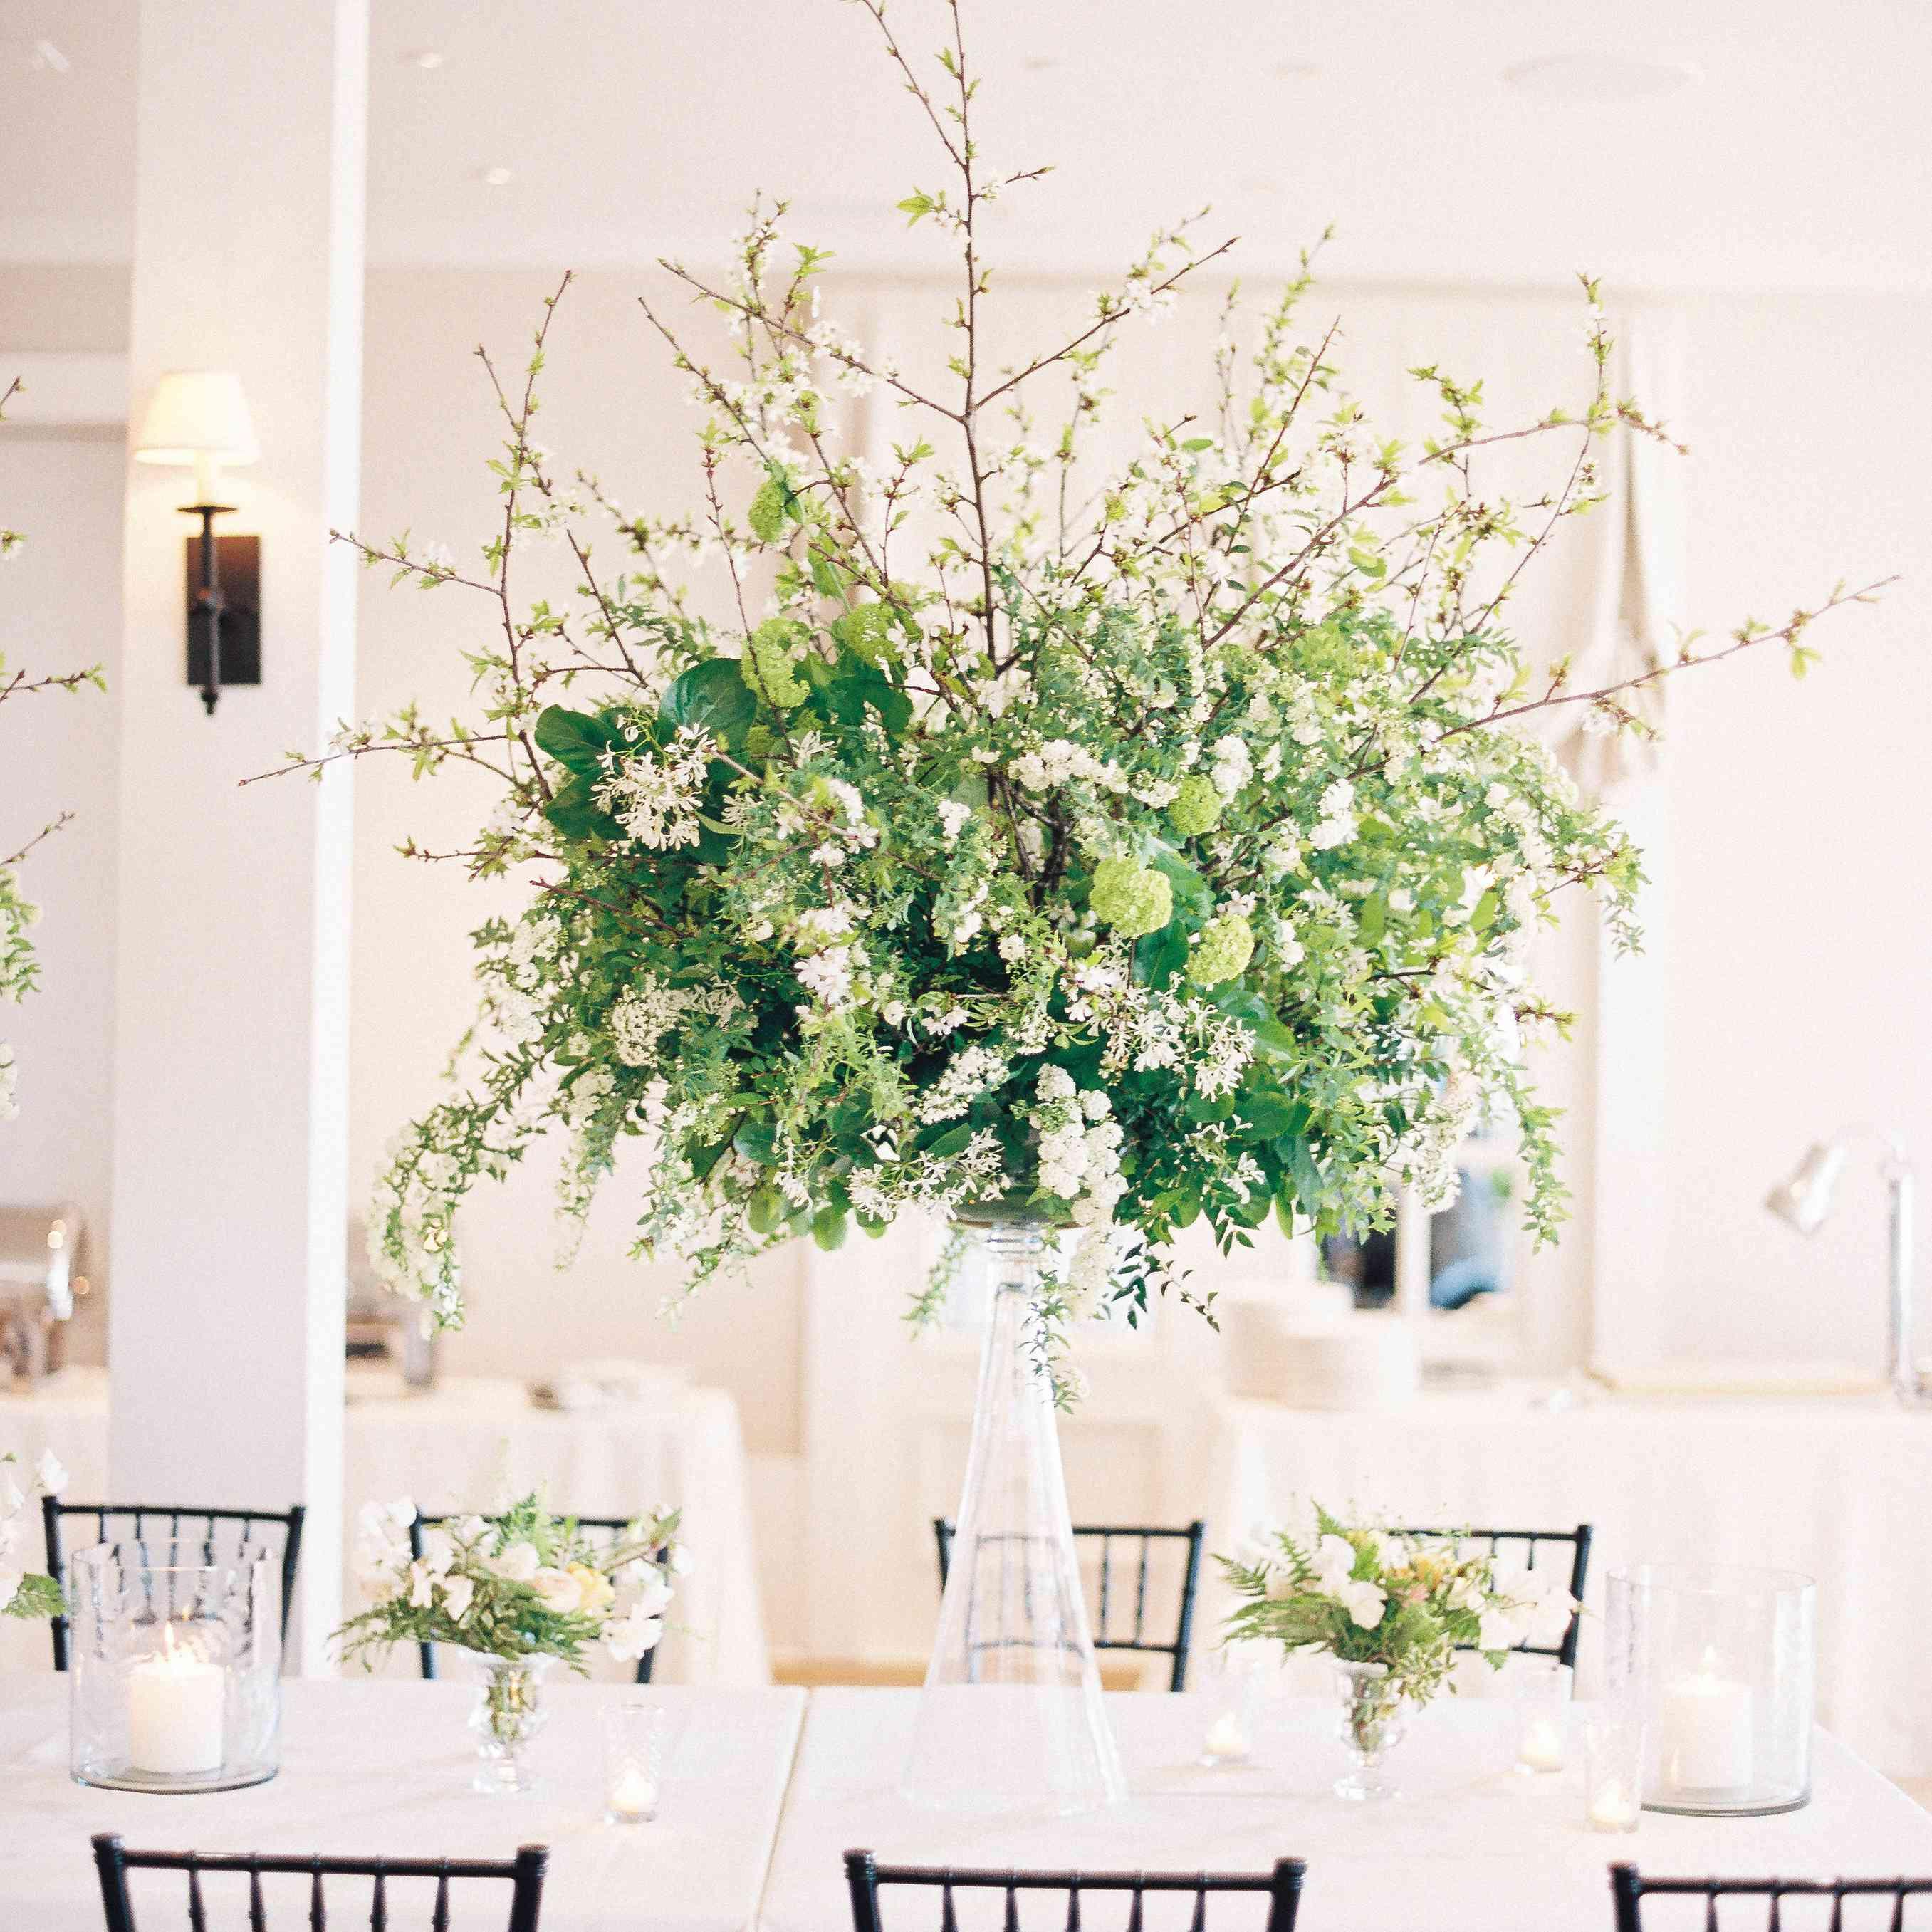 Reception dinner table setting